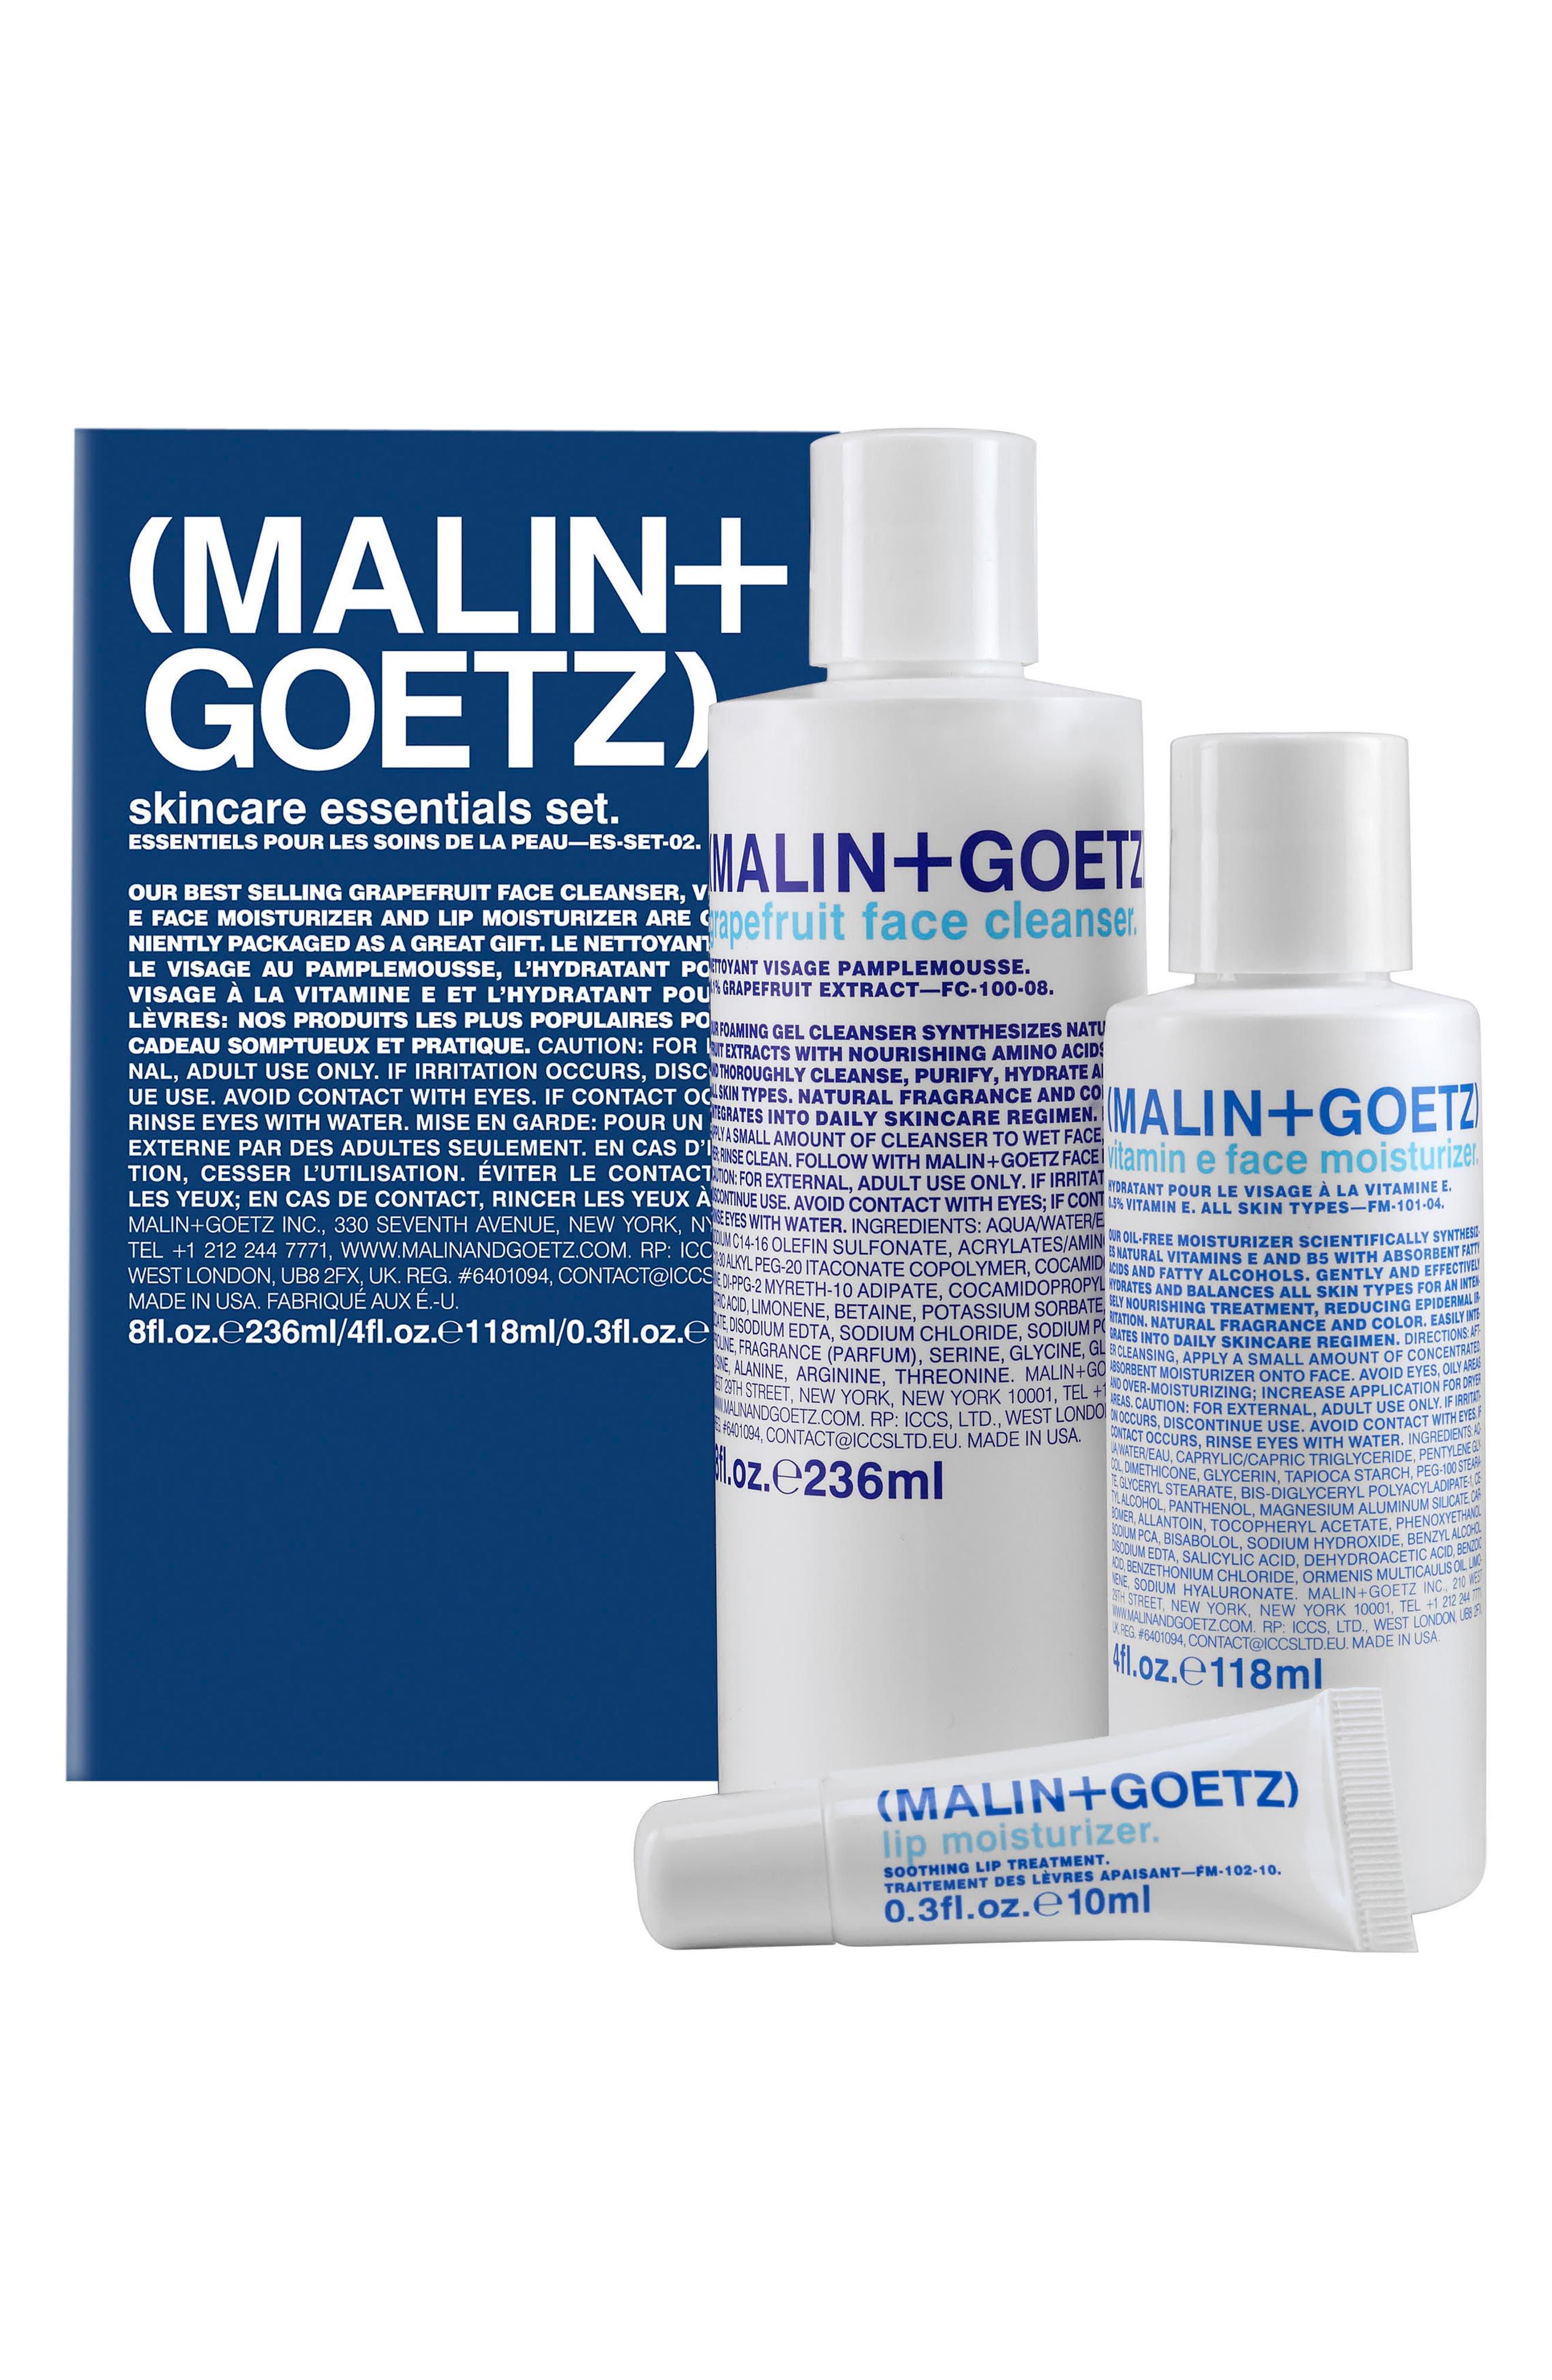 MALIN+GOETZ Skin Care Essentials Collection ($96 Value)